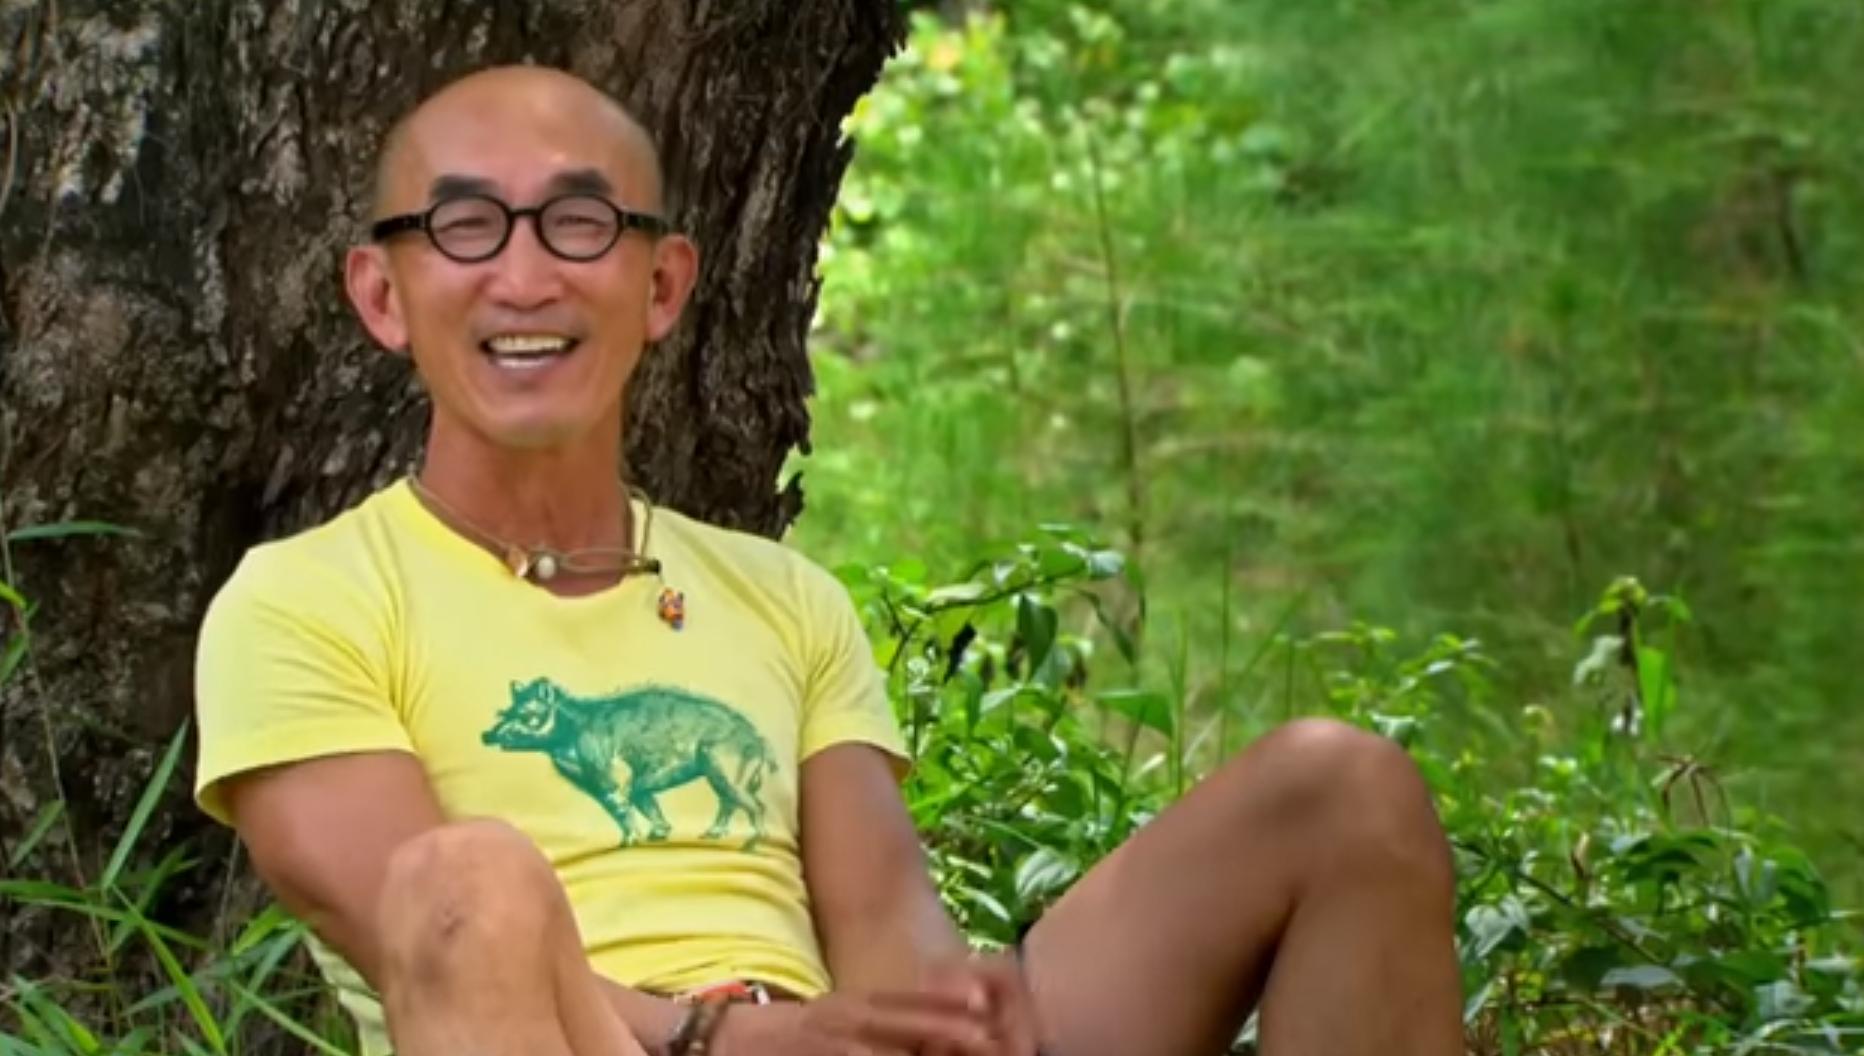 Tai revealed as Survivor: Kaoh Rong castaway